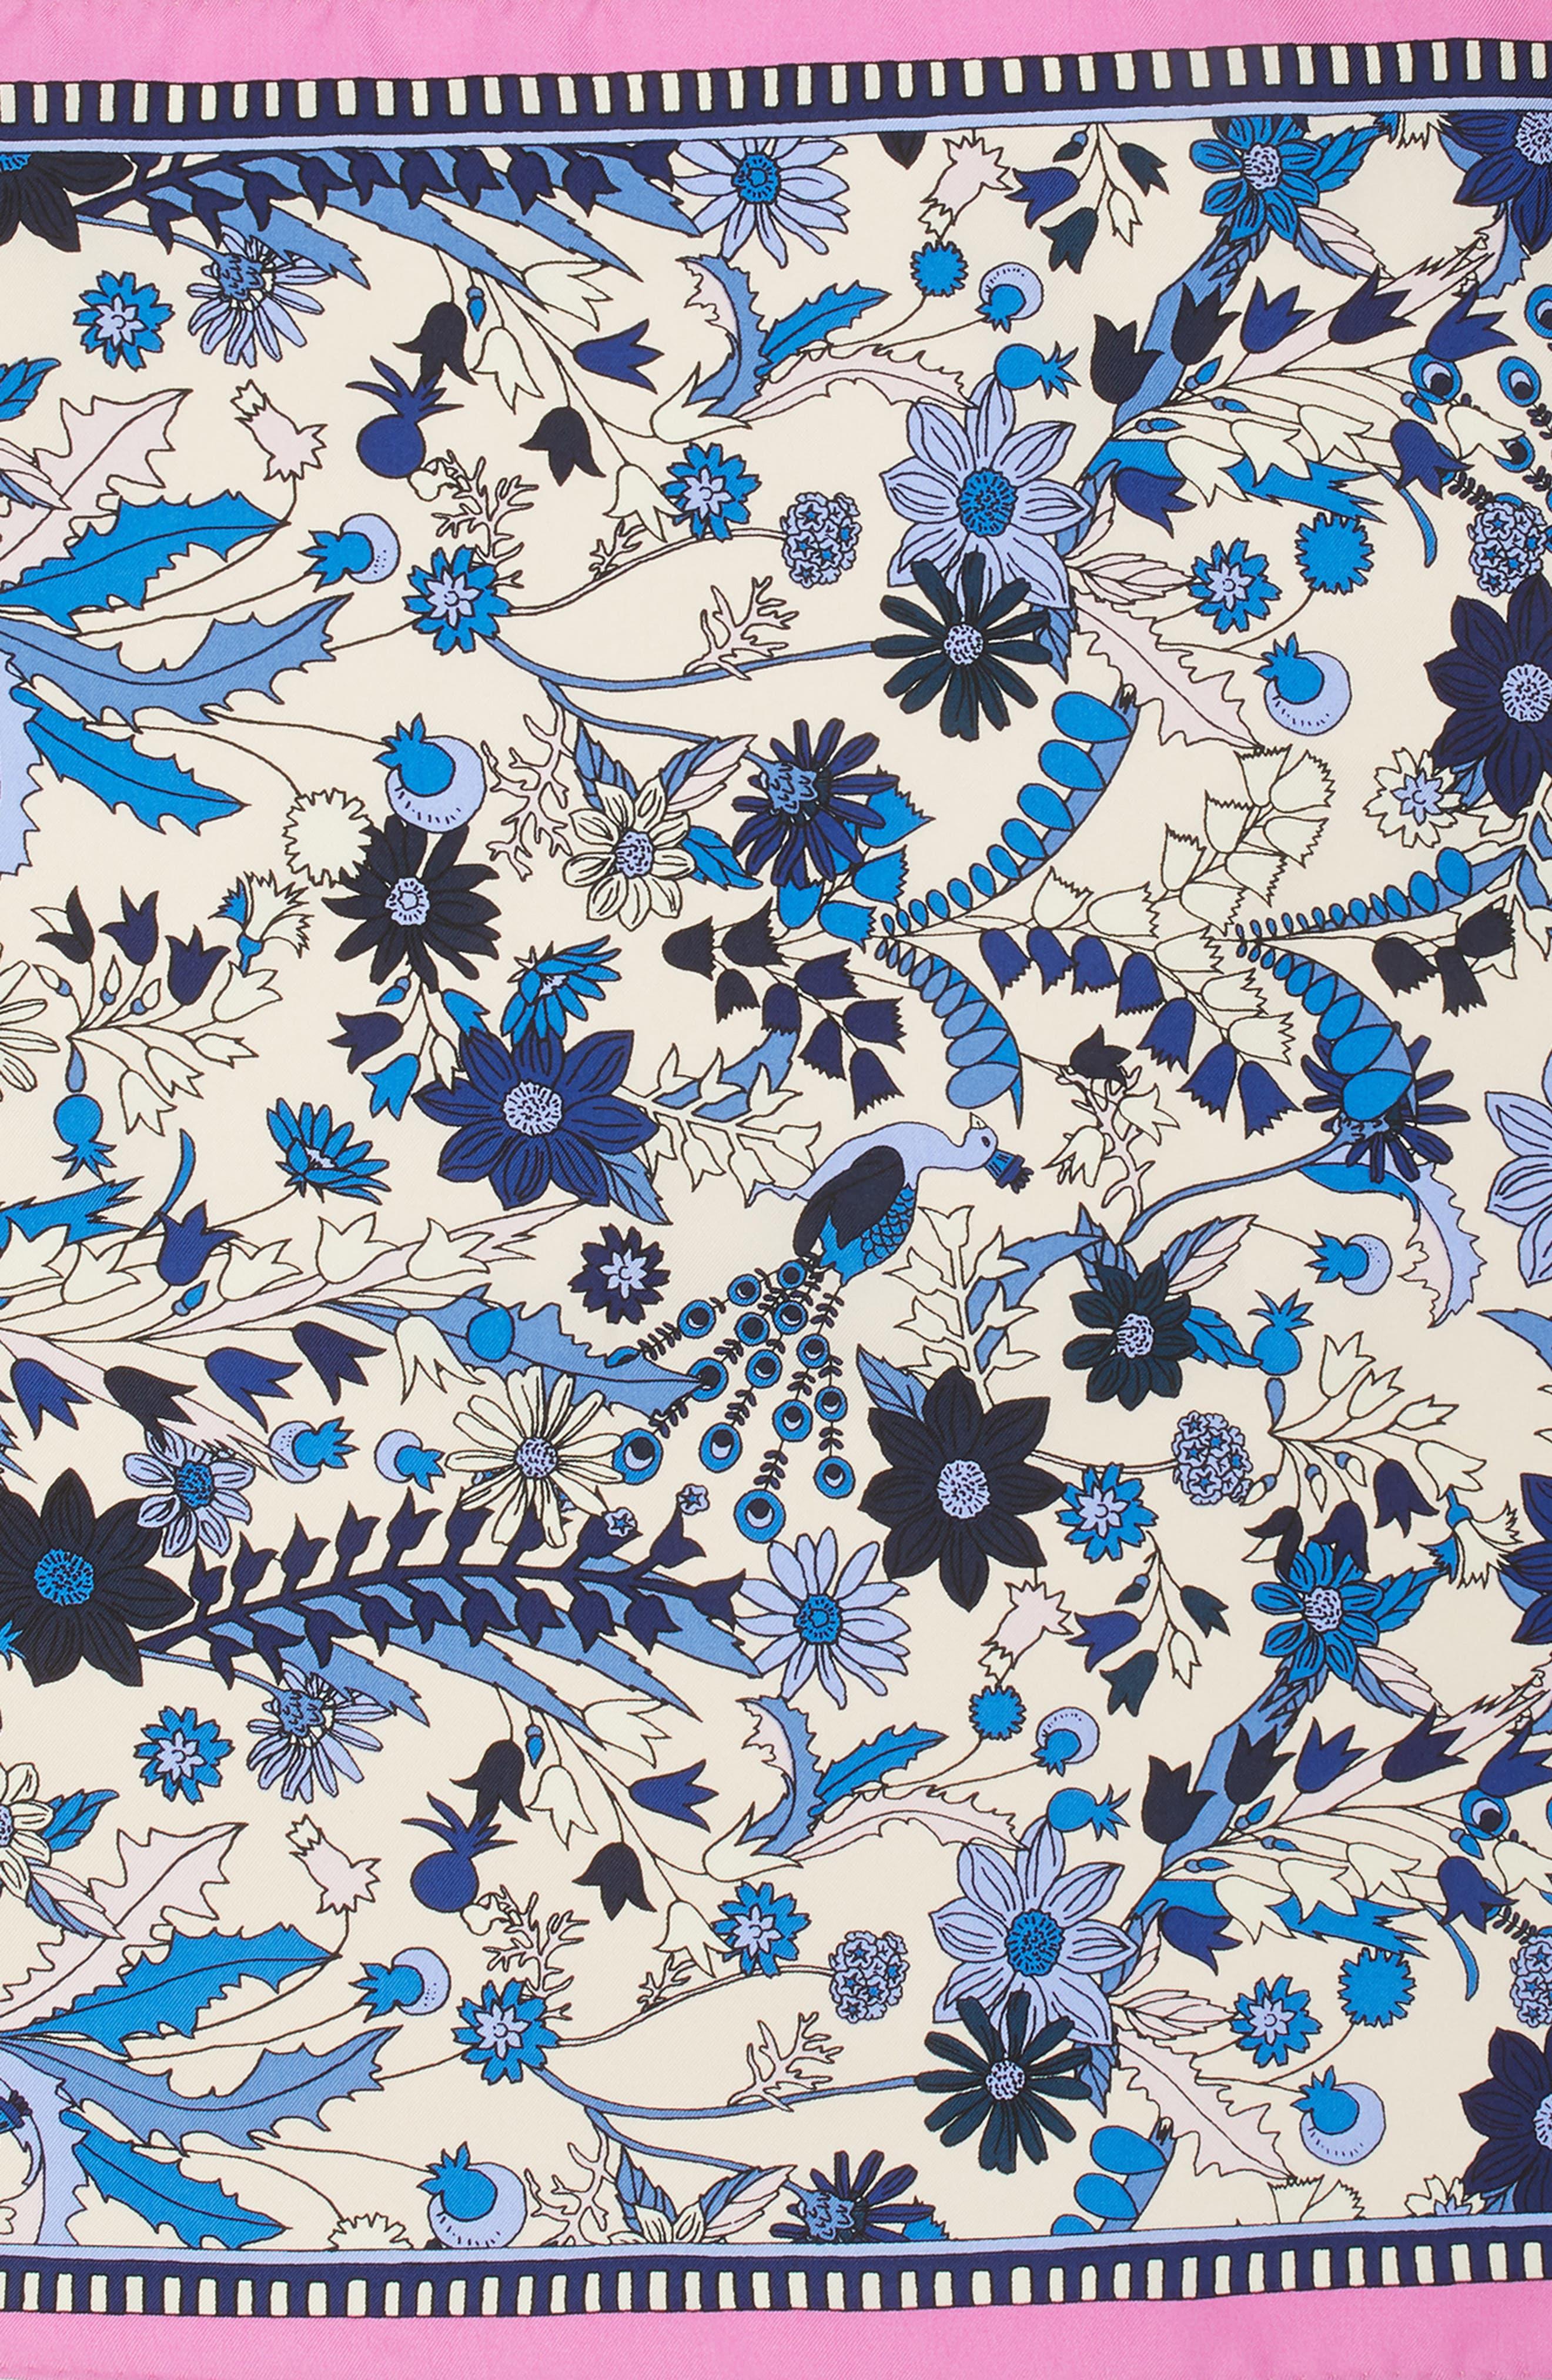 Meadow Folly Silk Scarf,                             Alternate thumbnail 4, color,                             Pink Meadow Folly